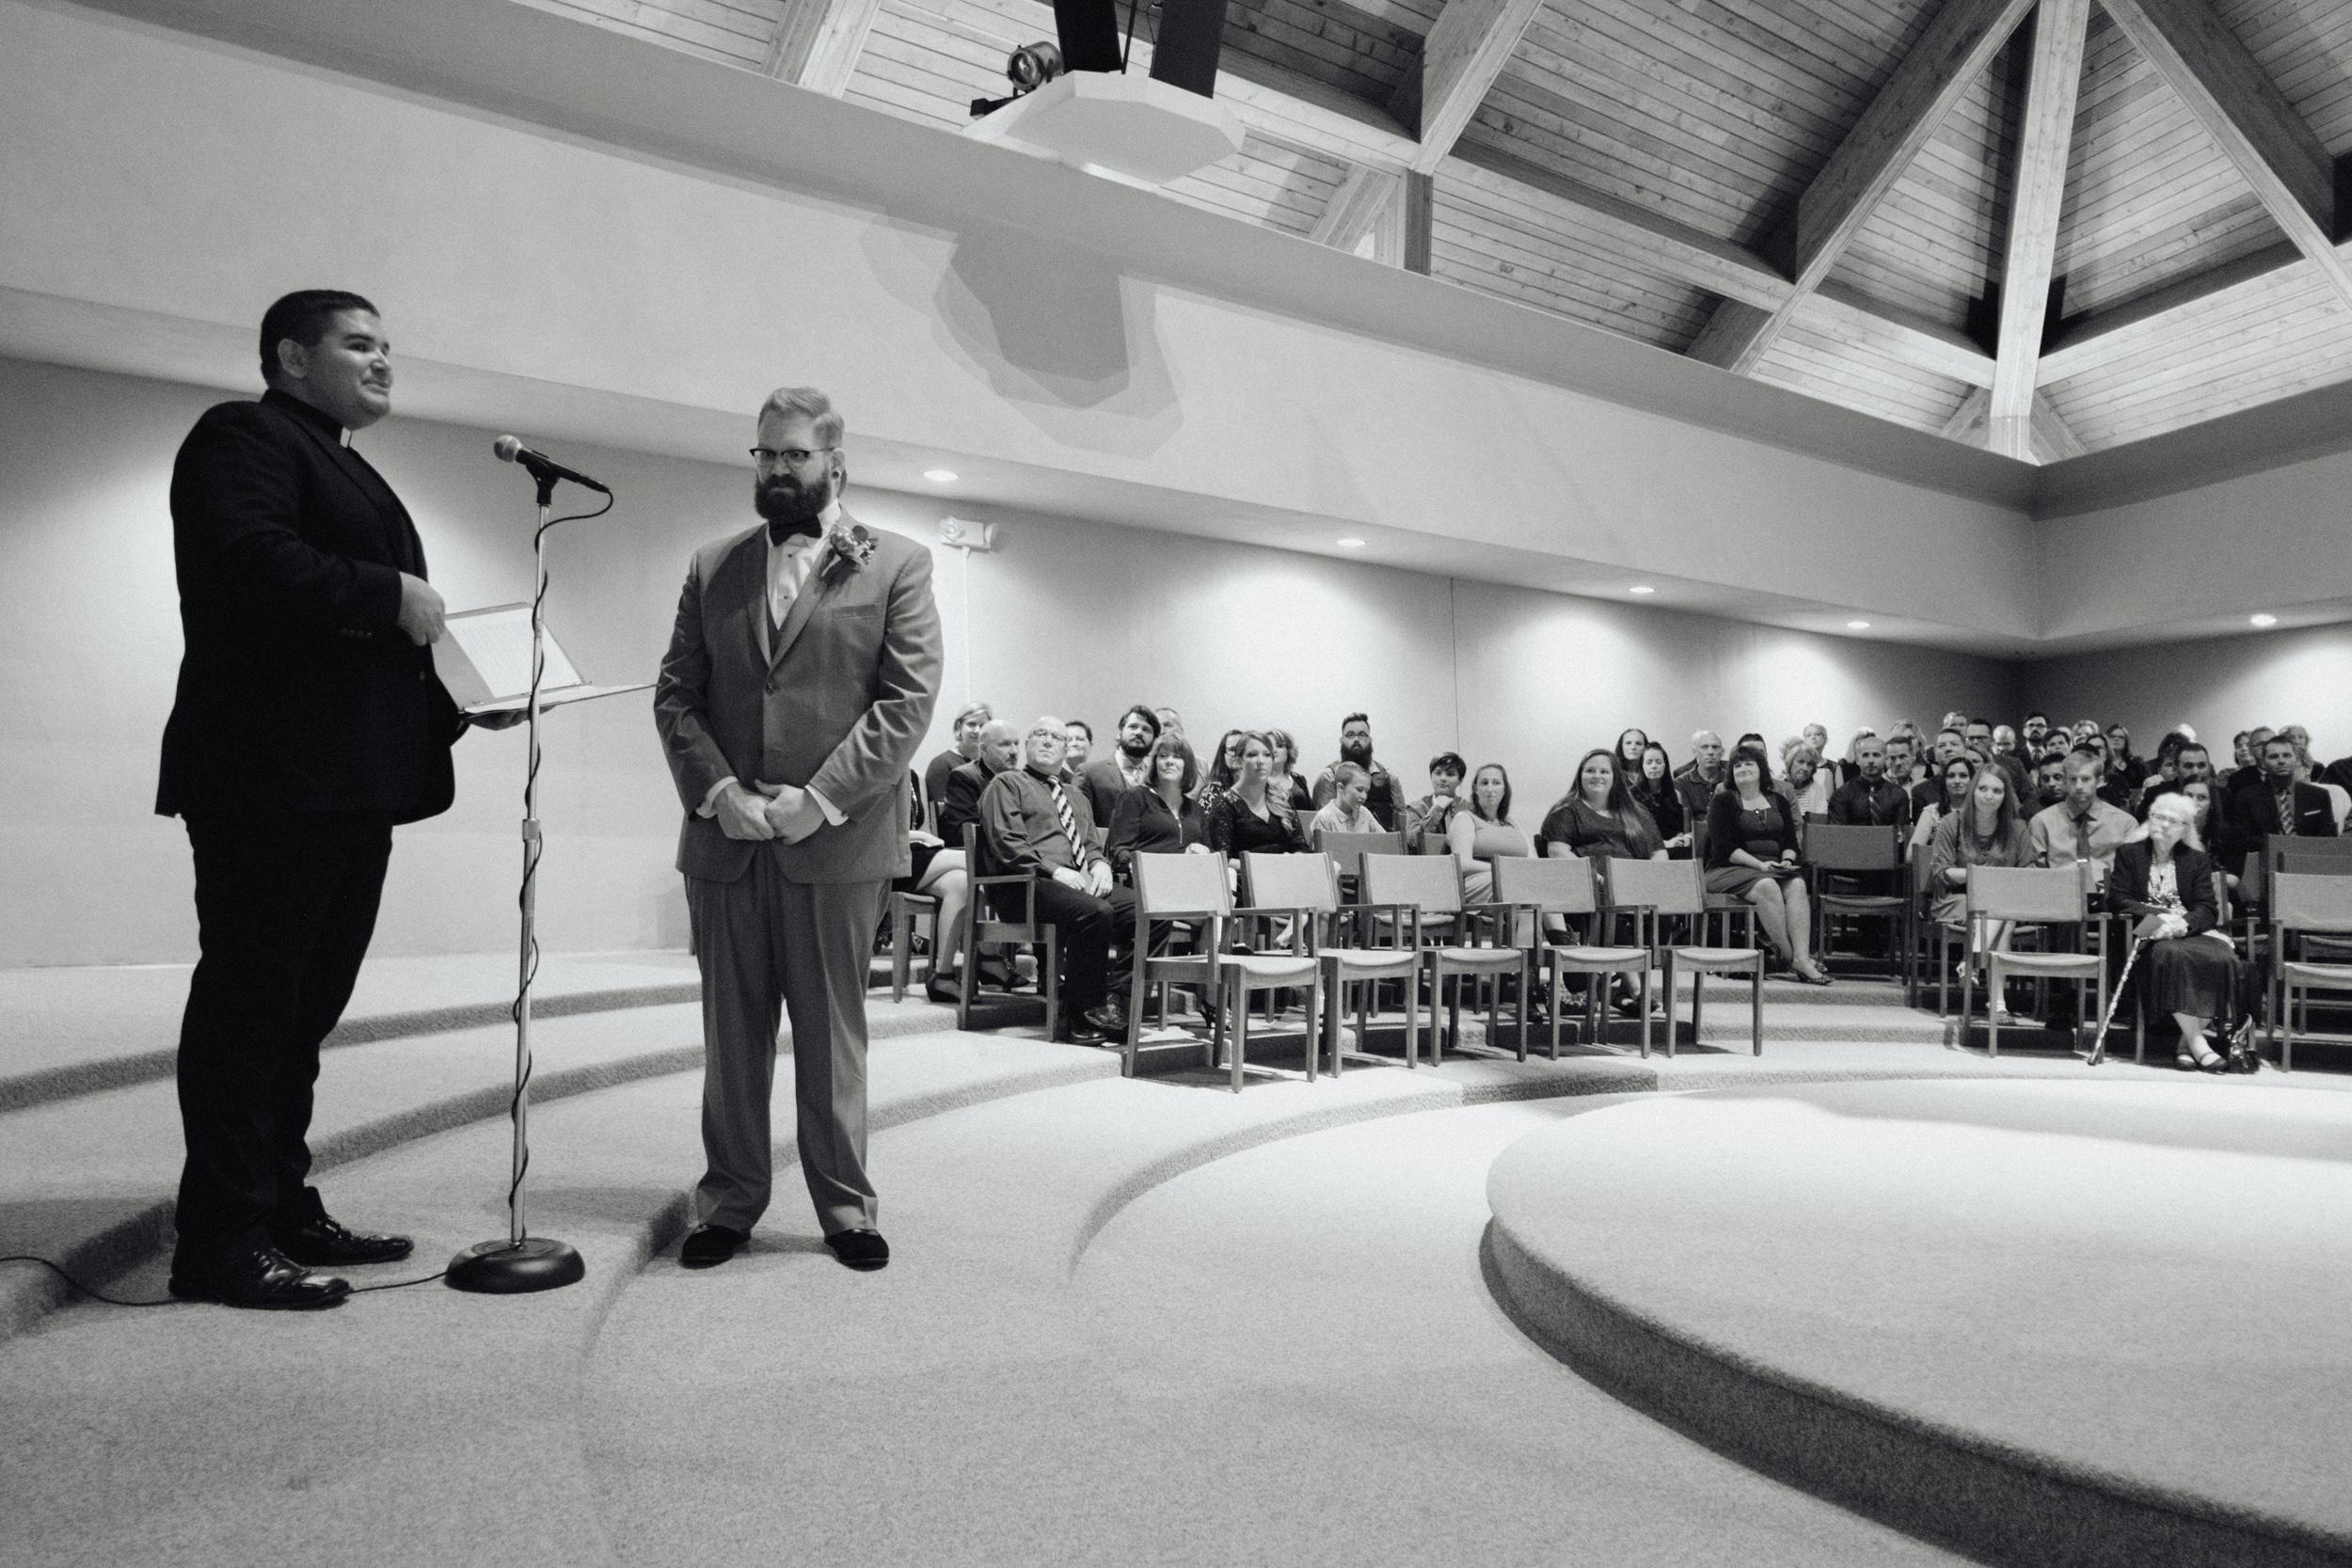 Christian & Sarah wedding photography by Brian milo-150.jpg